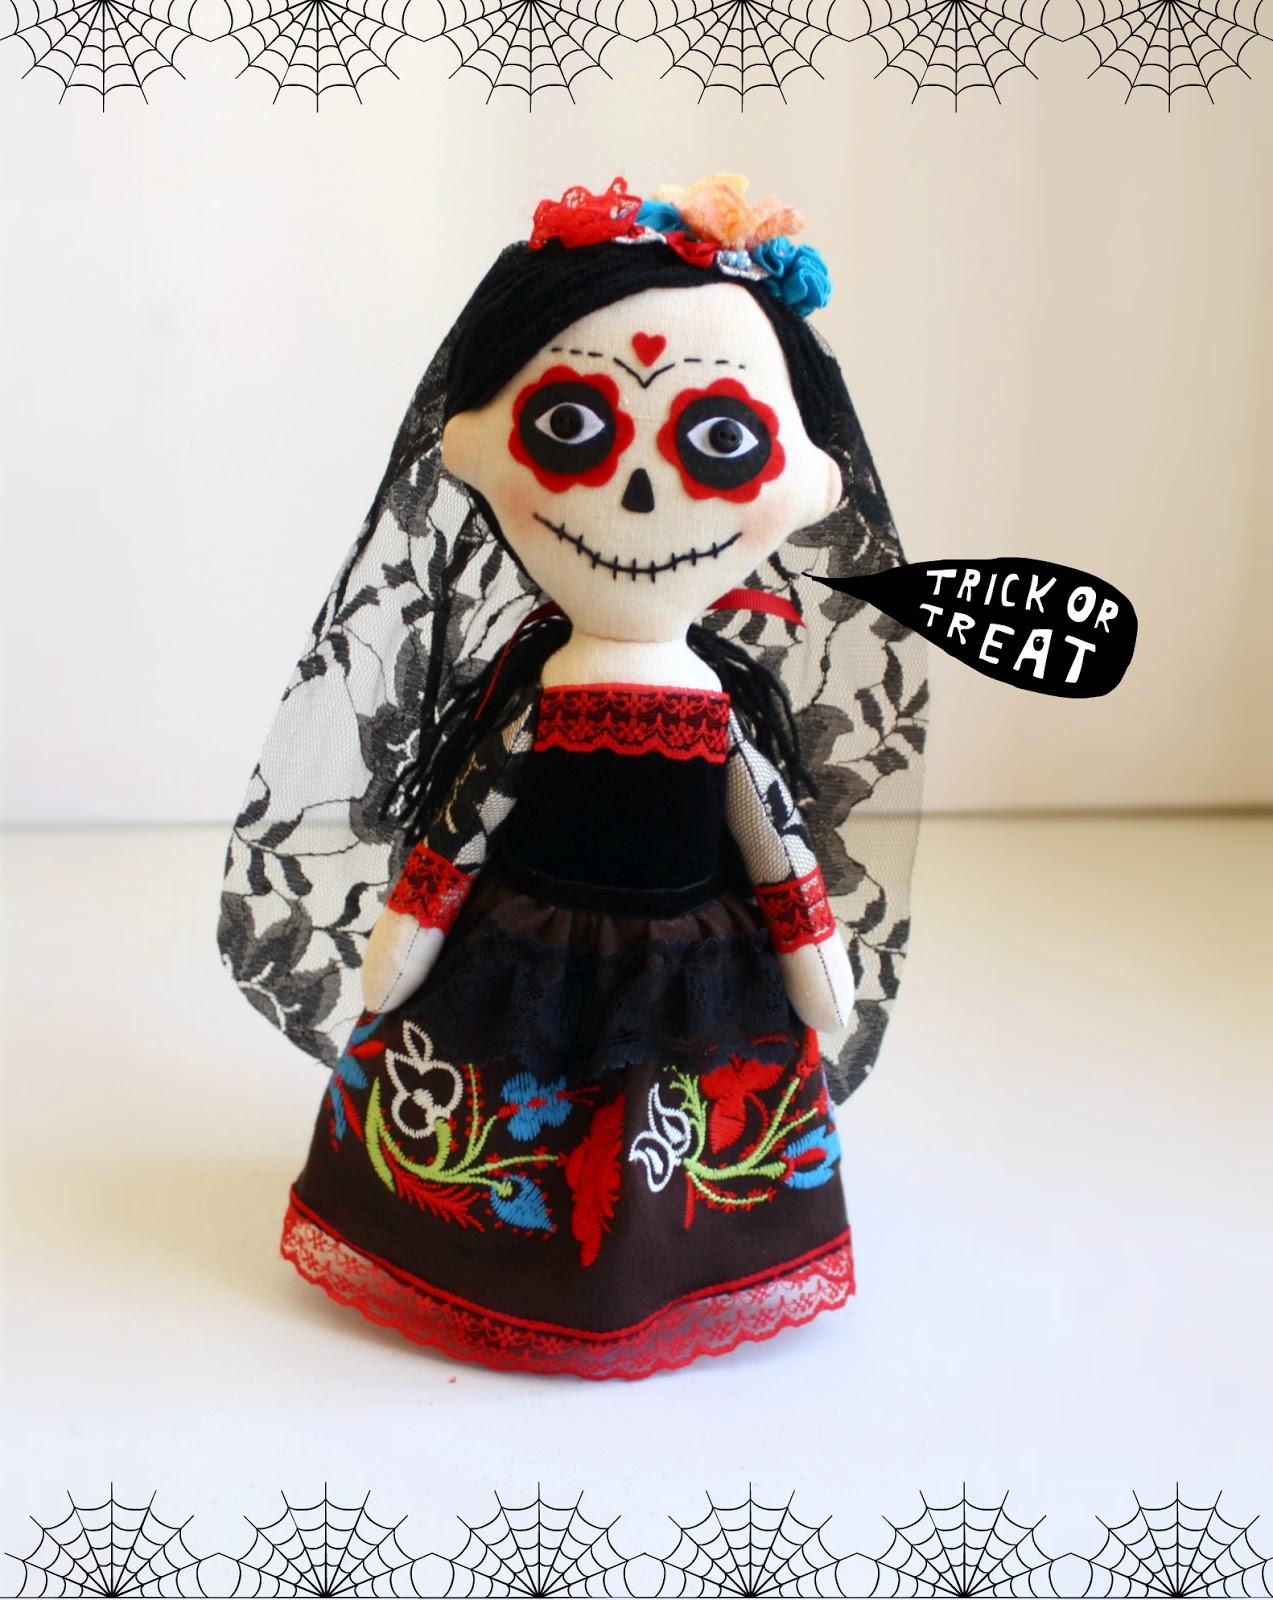 Comprar la muñeca Catrina. Trick or treat! Halloween